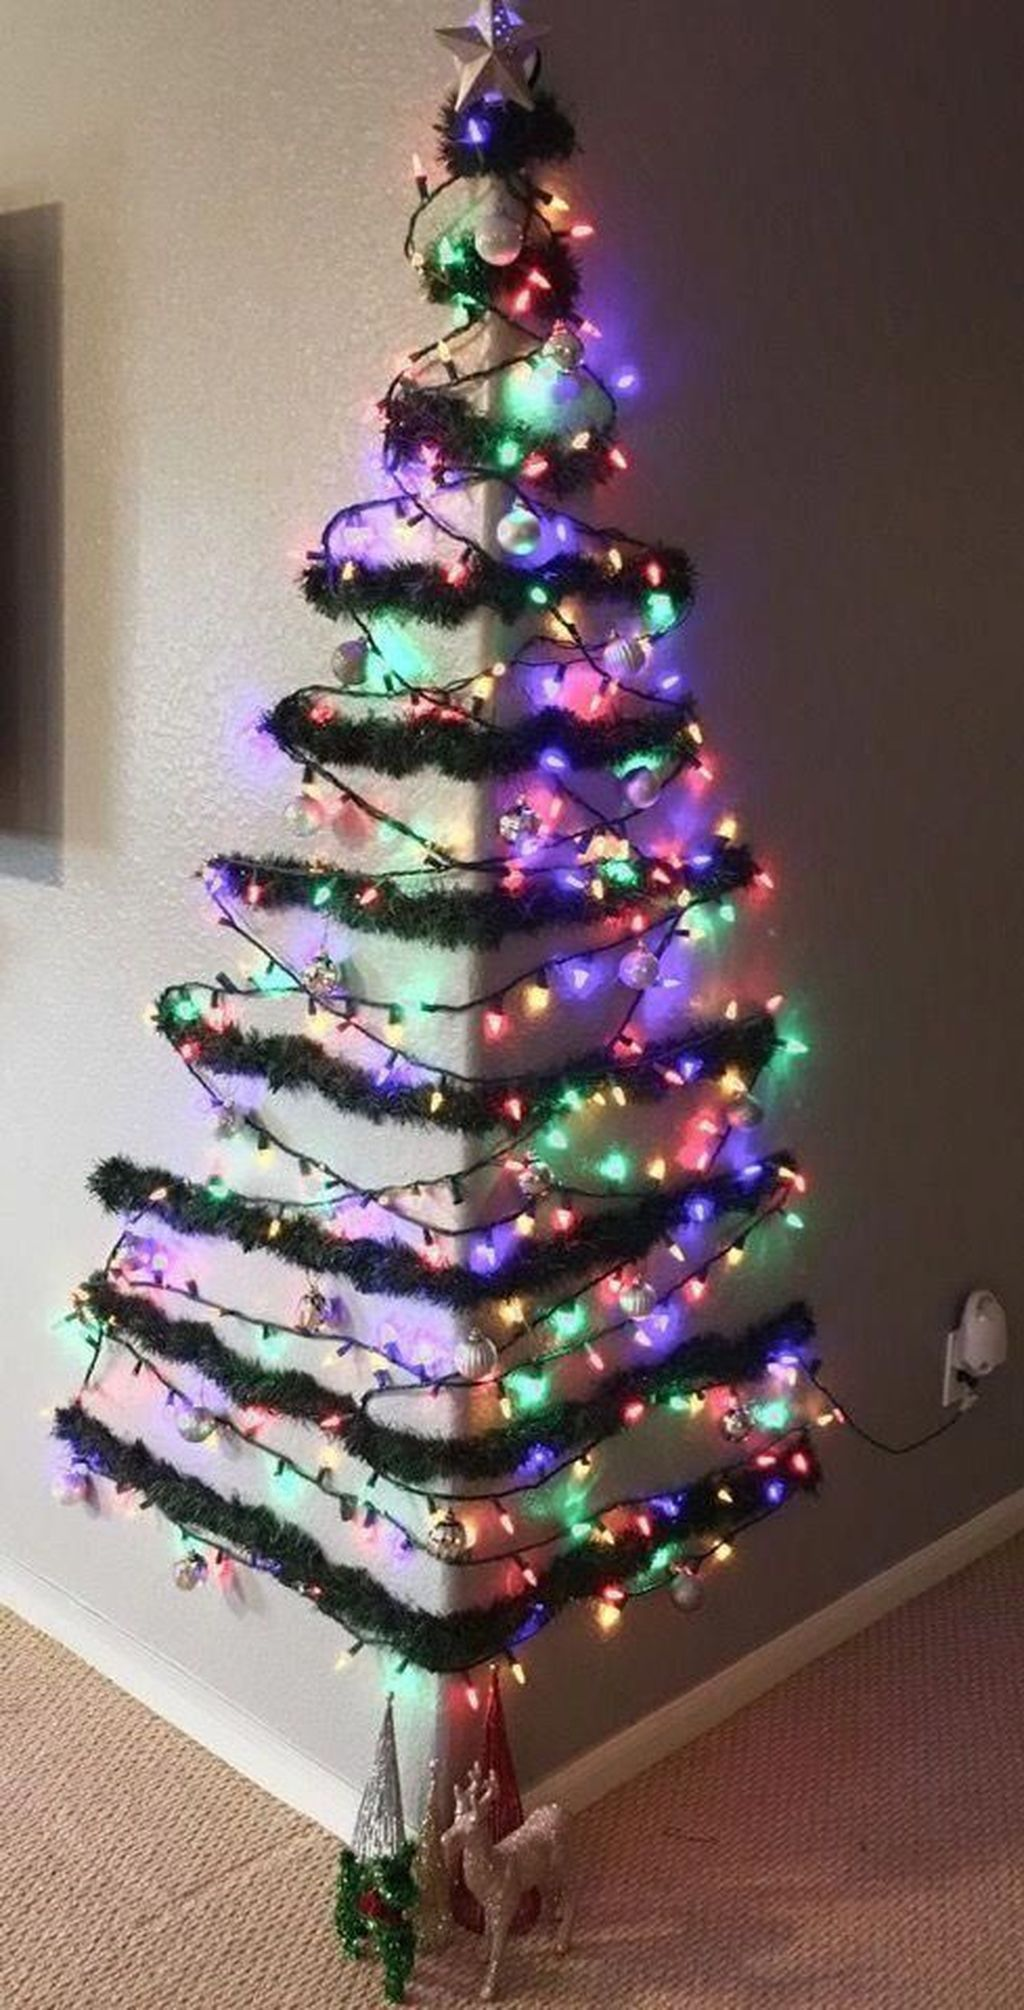 49 DIY Christmas Tree Wall Art Ideas-#Art #christmas #DIY #ideas #Tree #wall #christmastree